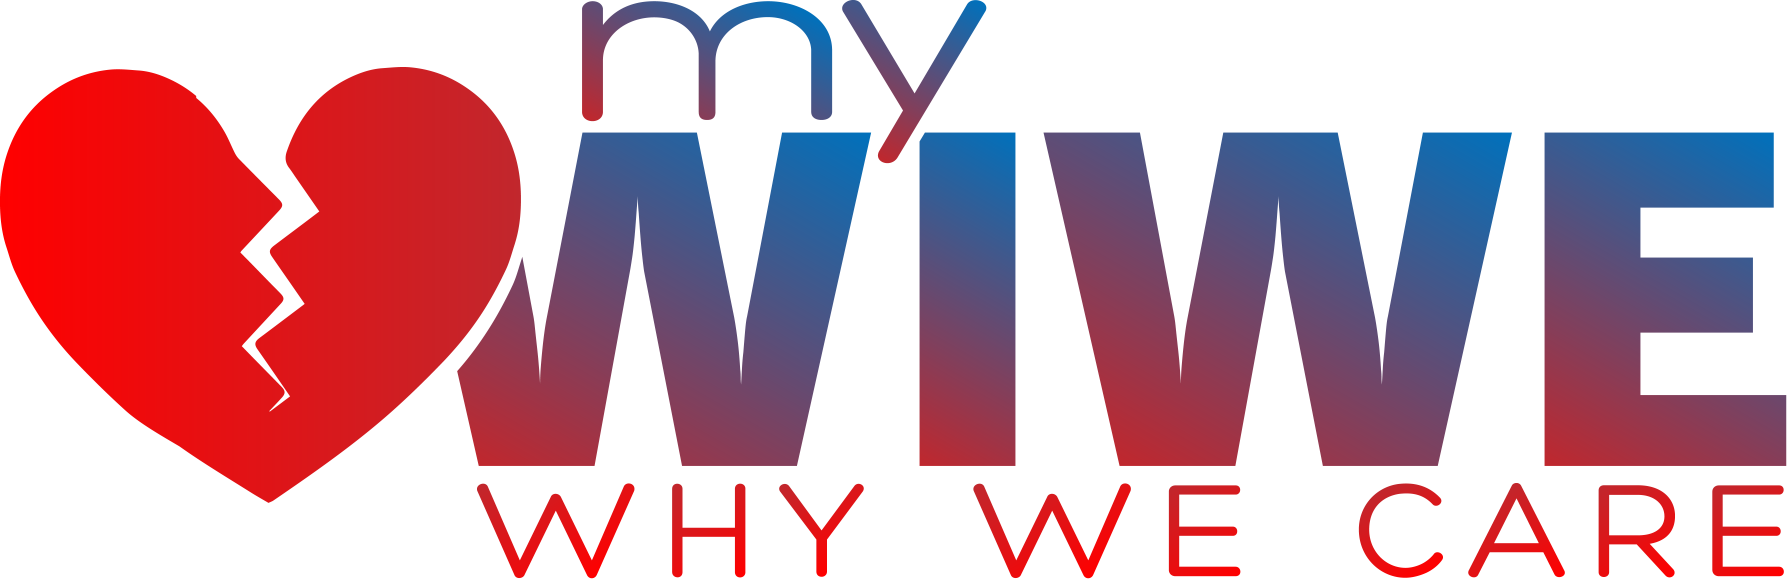 WIWE Shop